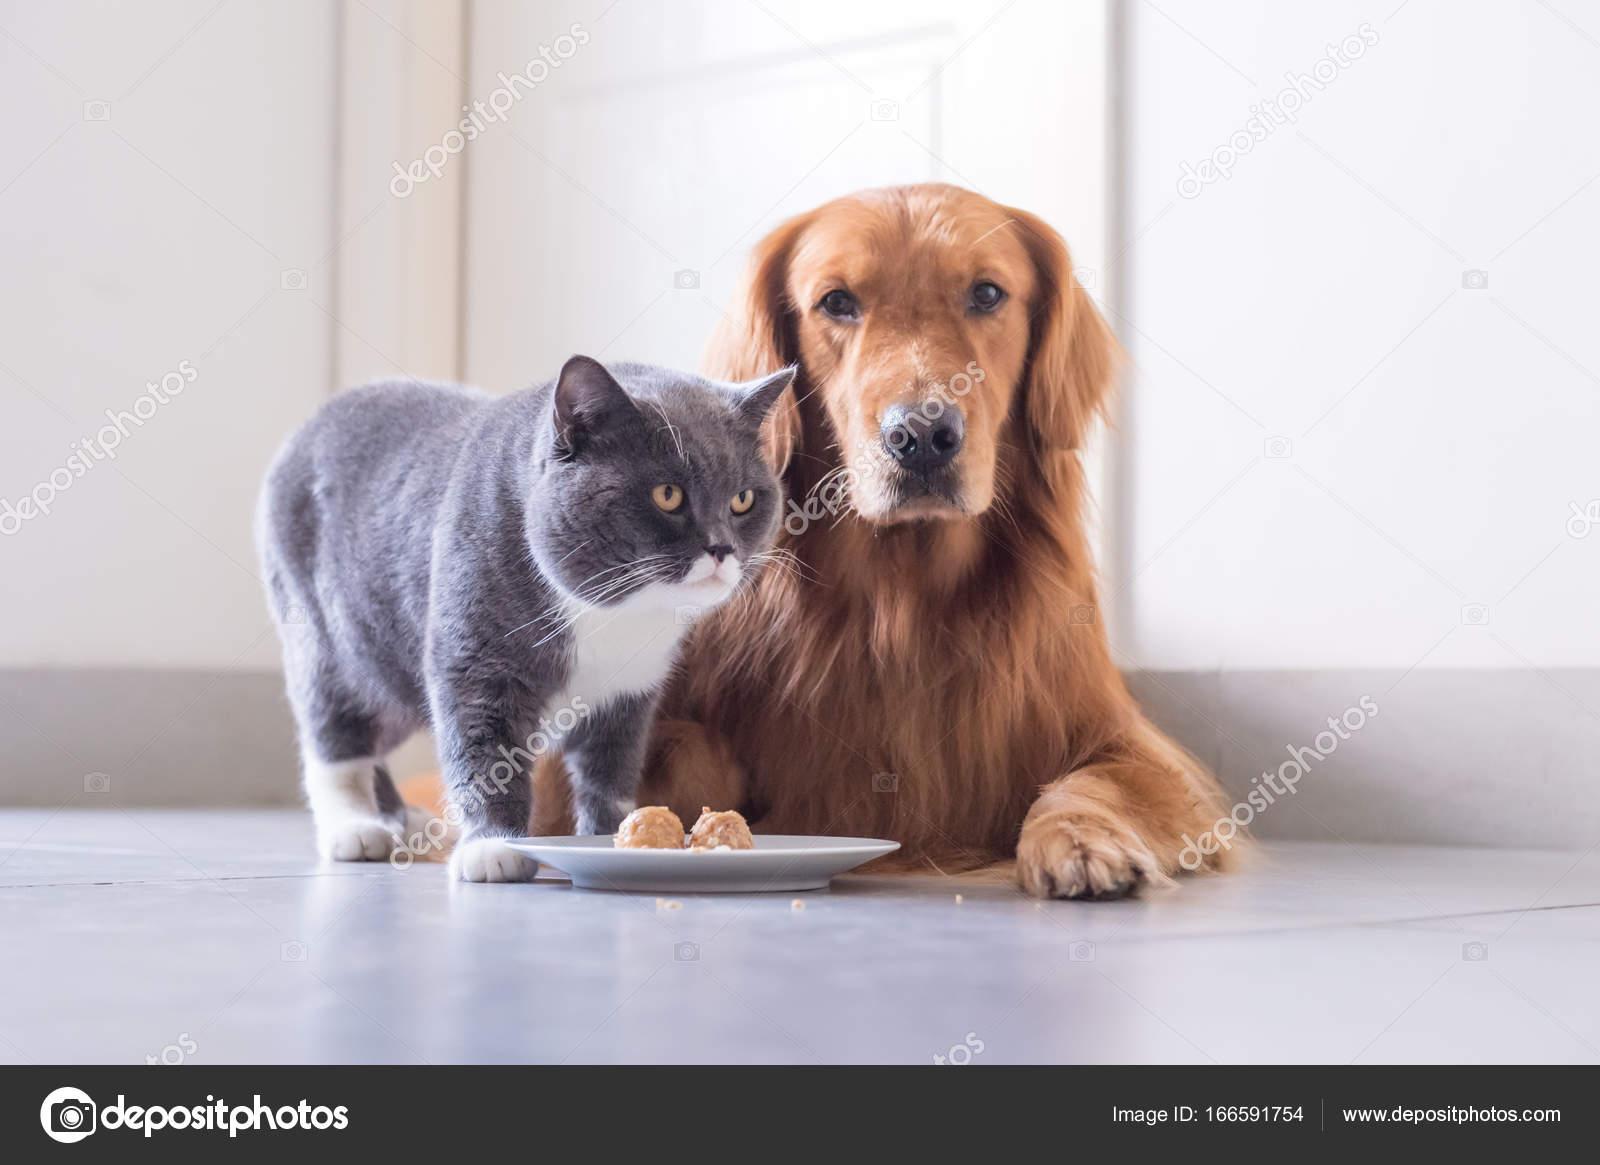 British shorthair cat and Golden Retriever — Stock Photo